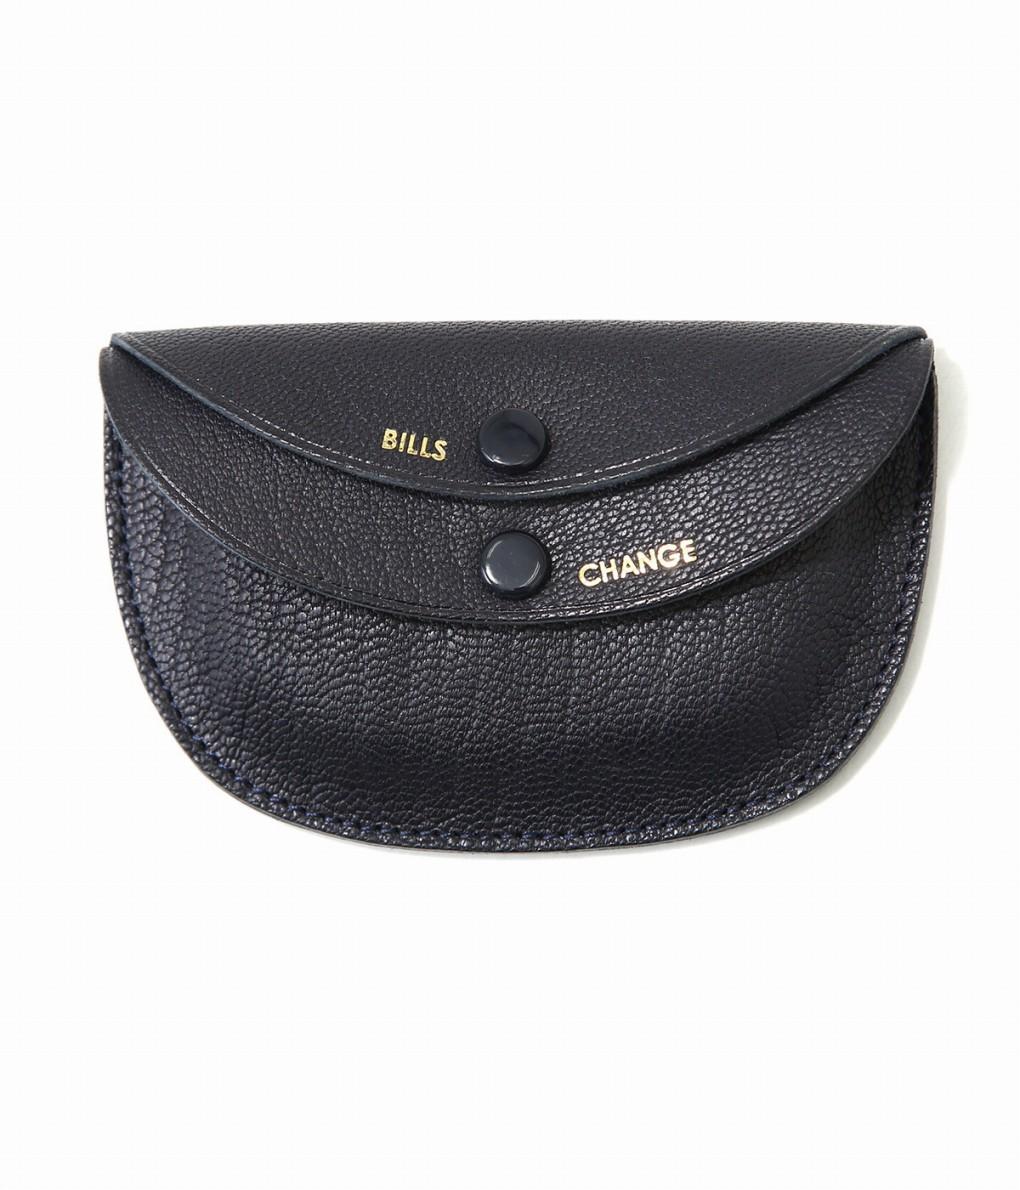 KAPTAIN SUNSHINE / キャプテンサンシャイン : Round Wallet (Goat Leather) : ラウンド ウォレット 財布 メンズ レディース レザー : KS9SGD09 【NOA】